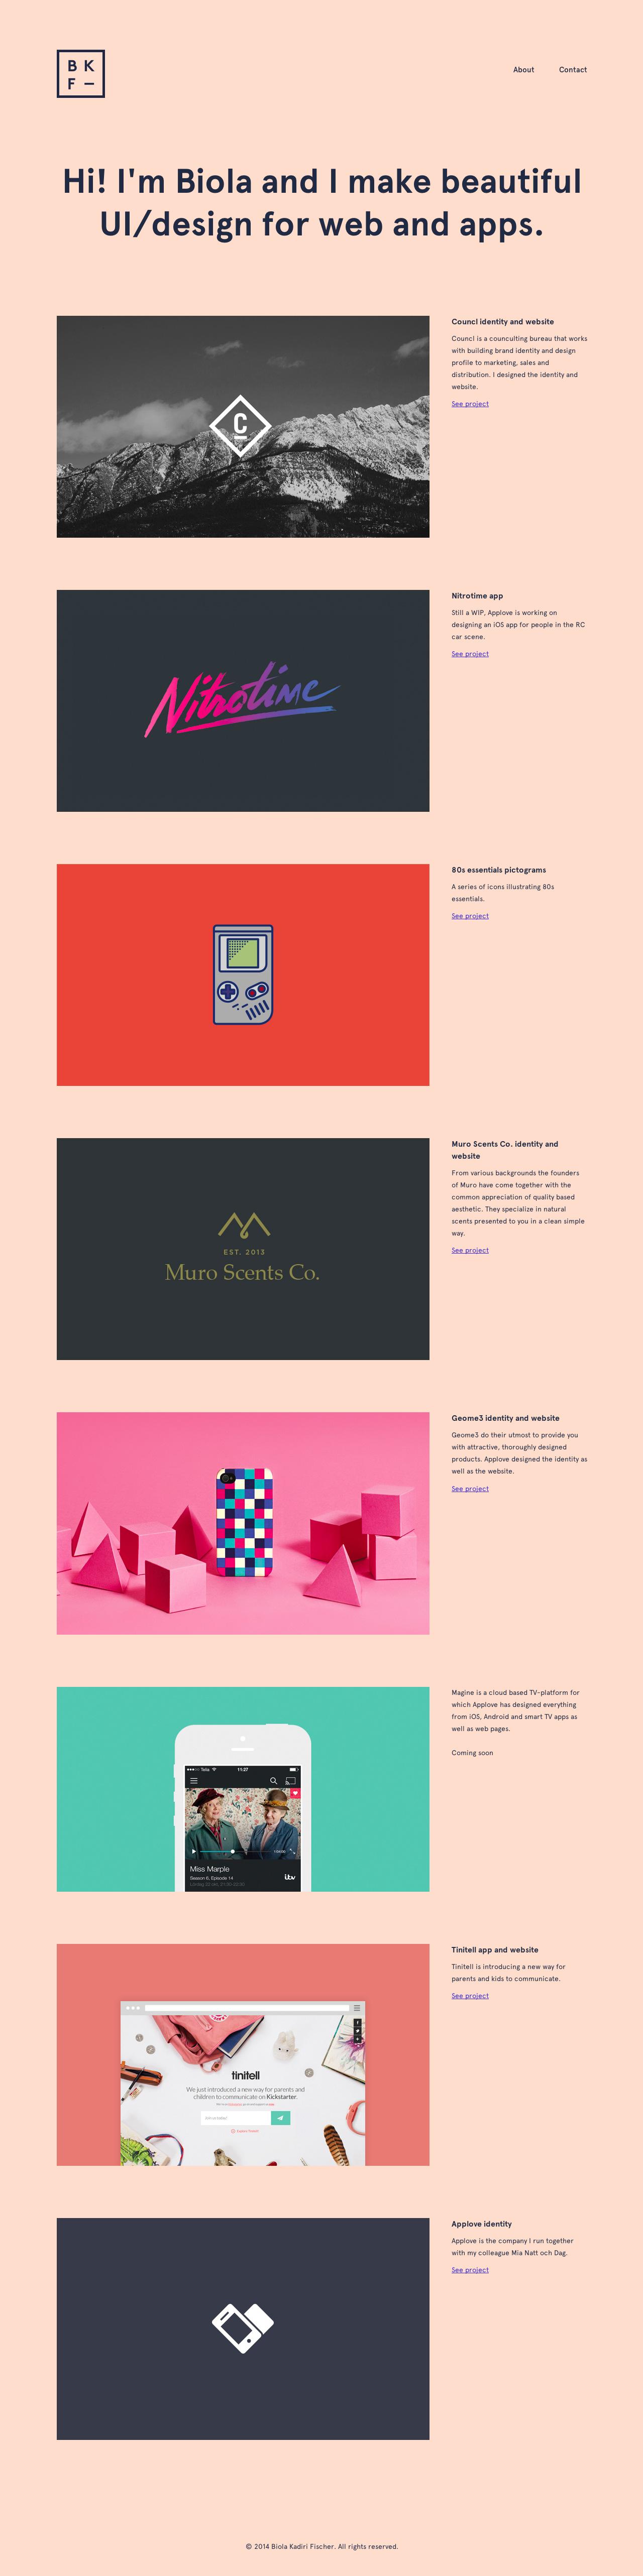 Biola Kadiri Fischer Website Screenshot